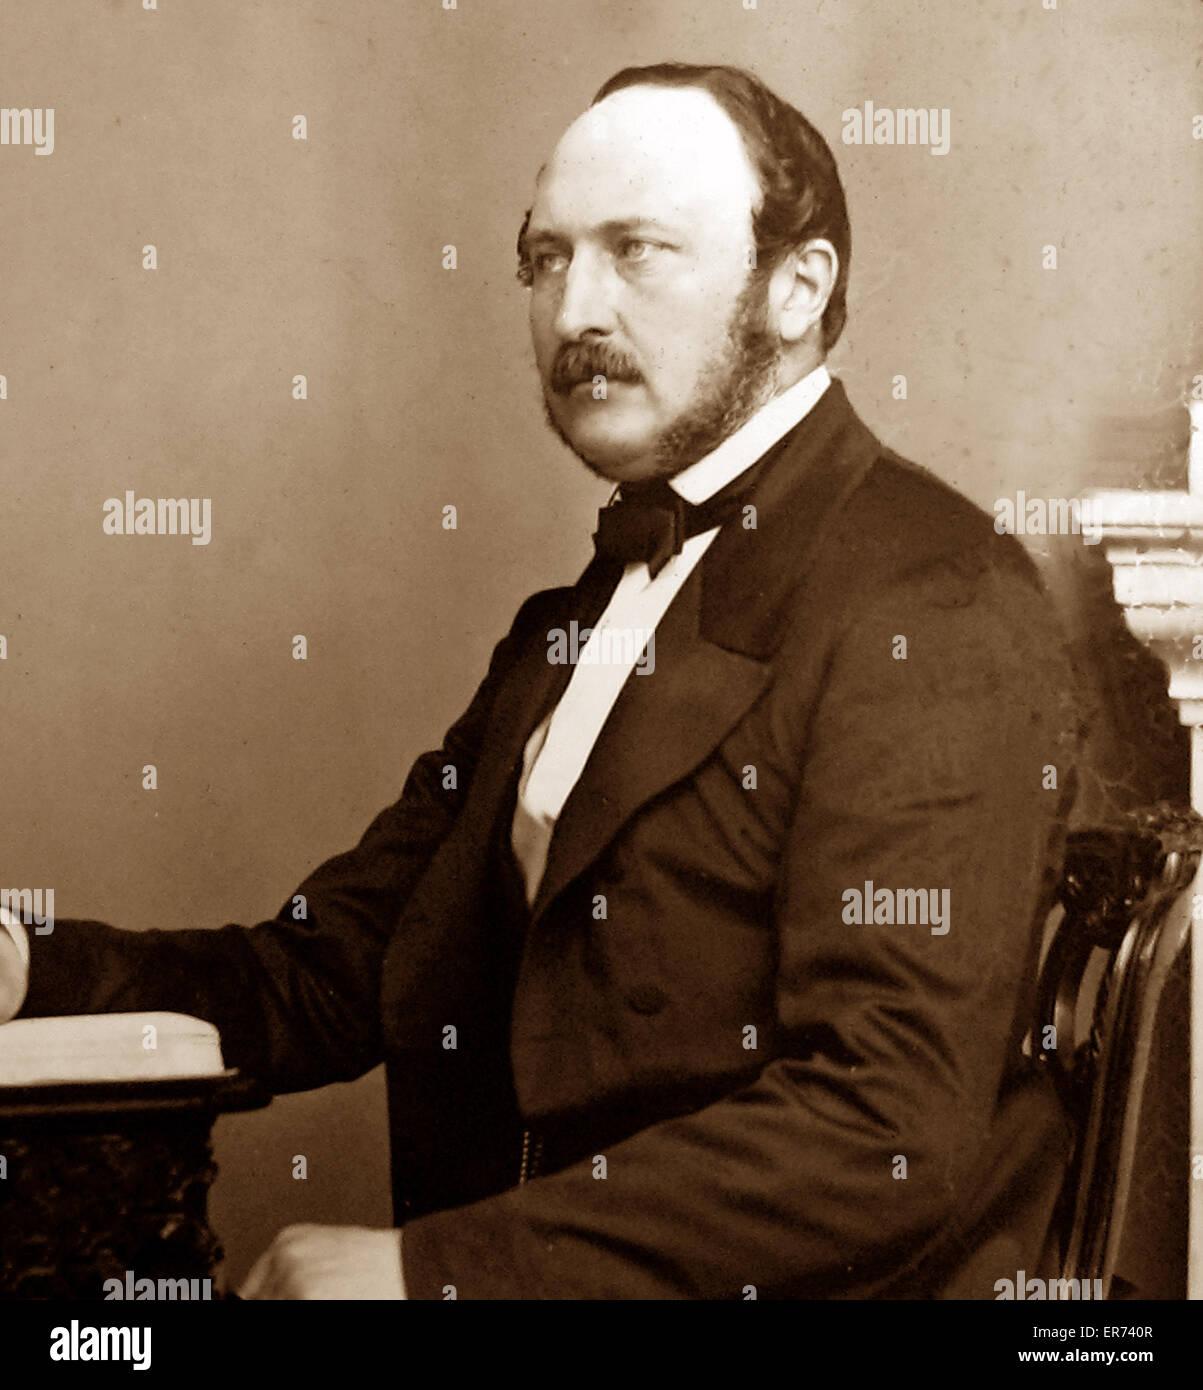 Prince Albert Victorian period - Stock Image